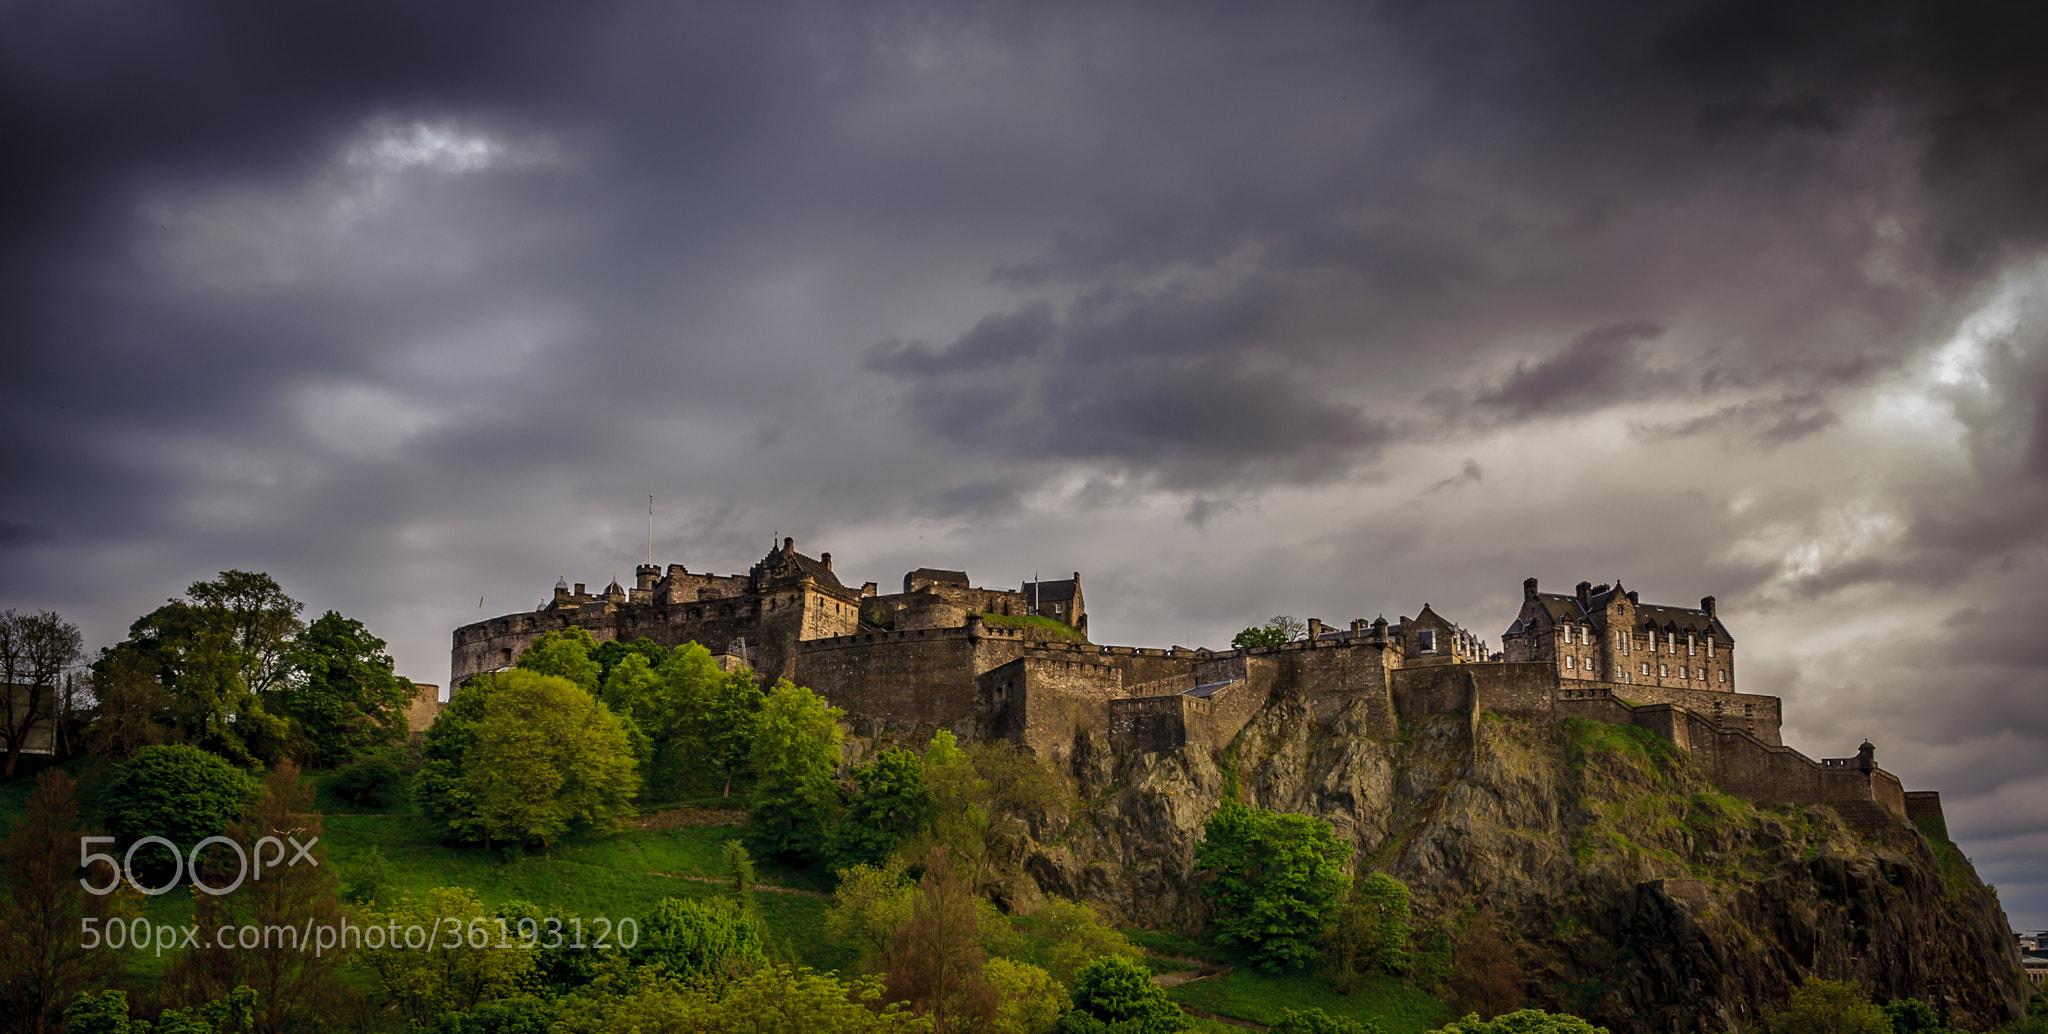 Photograph Edinburgh Castle by blank_re on 500px